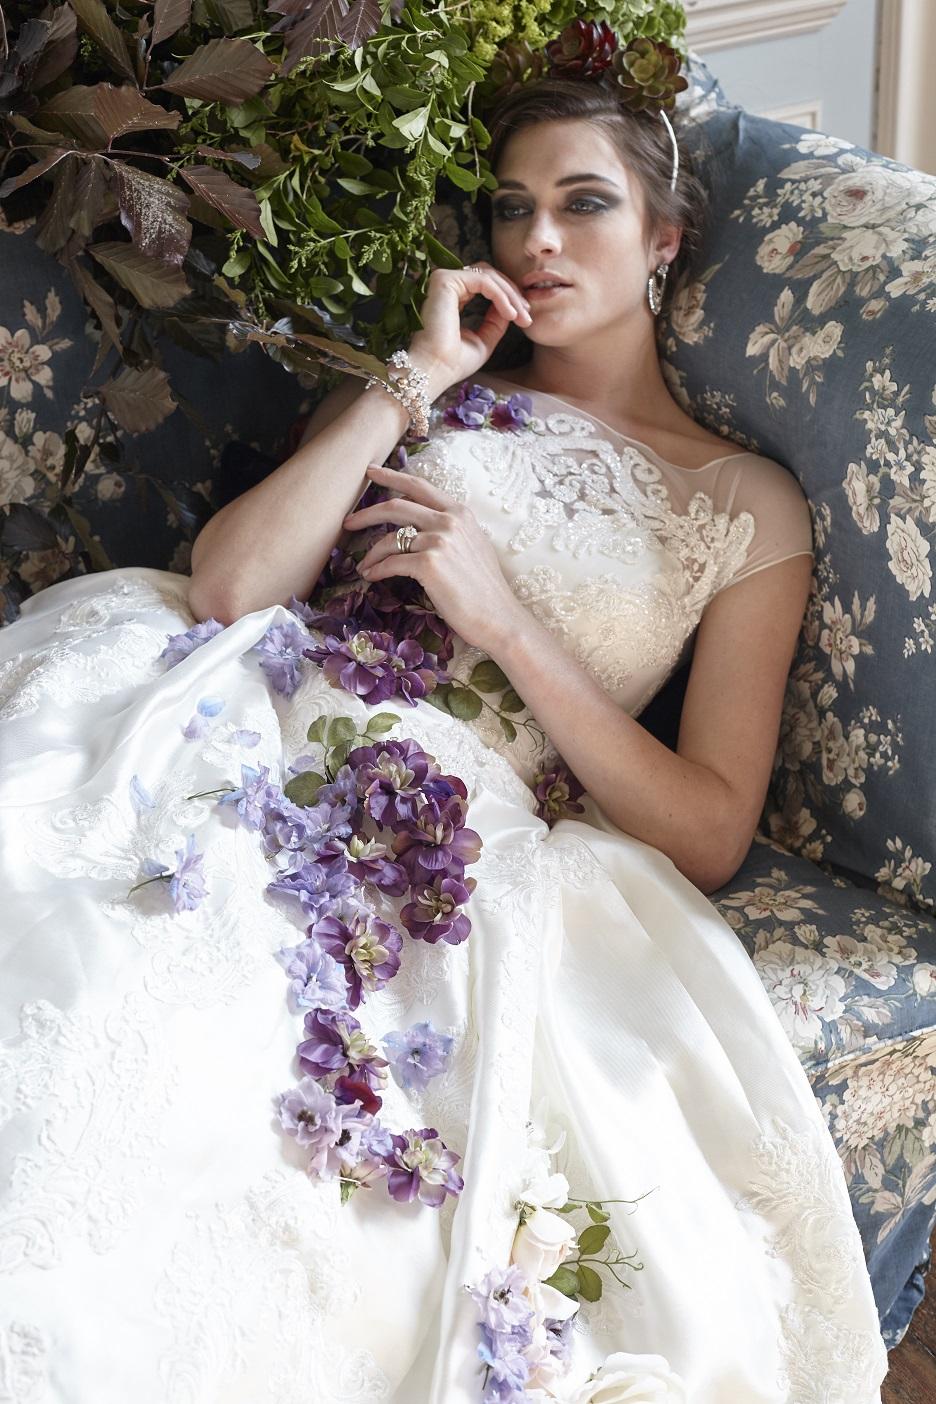 sofa_dress_bride.jpg